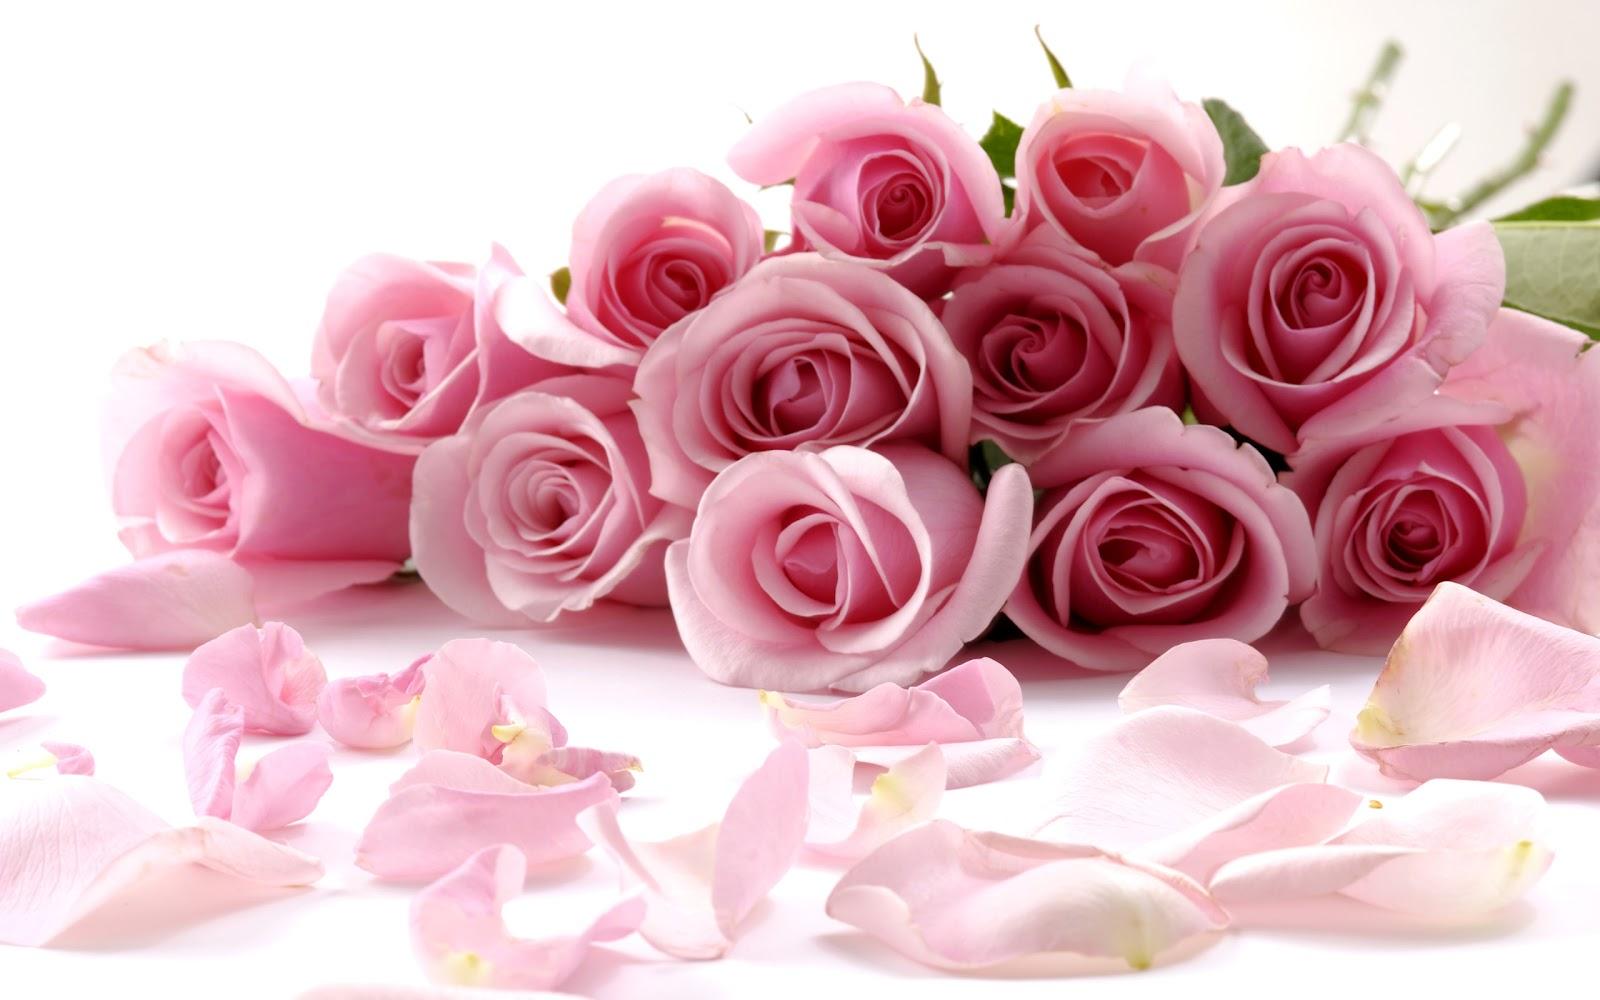 http://3.bp.blogspot.com/-es5AdVZZzi4/UAO4NHh8BeI/AAAAAAAAAk4/iLOBDIVWbwg/s1600/hd+wallpapers+of+roses-1.jpg